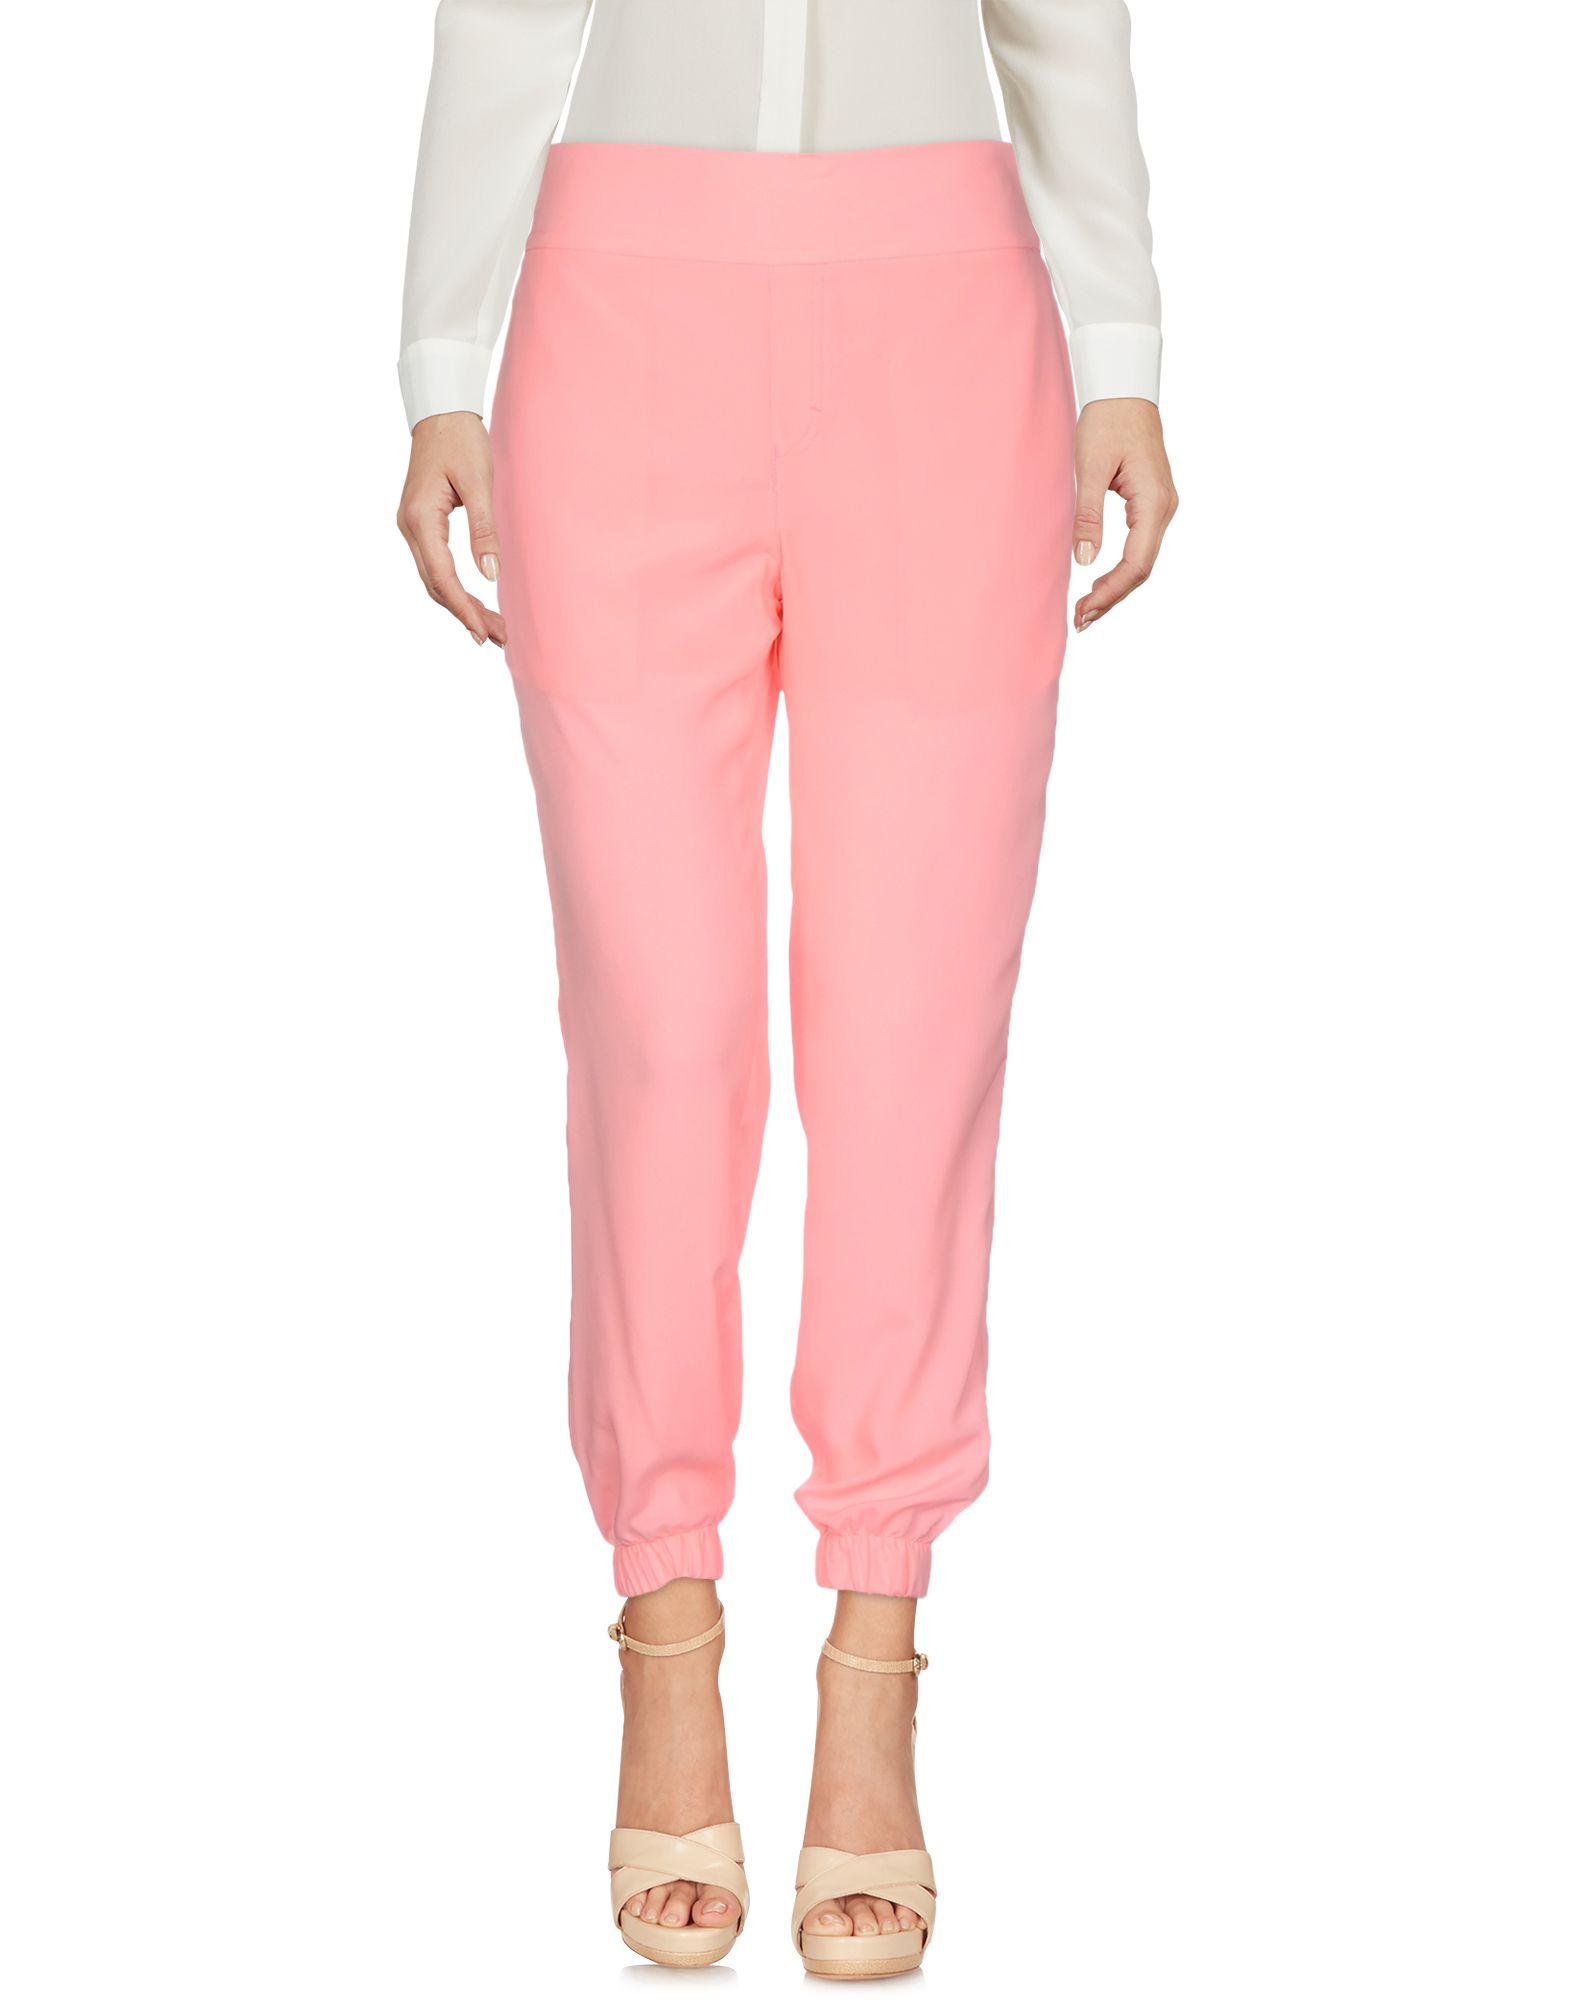 Pantalone Violet Atos Lombardini Donna - Acquista online su 3zFTeY